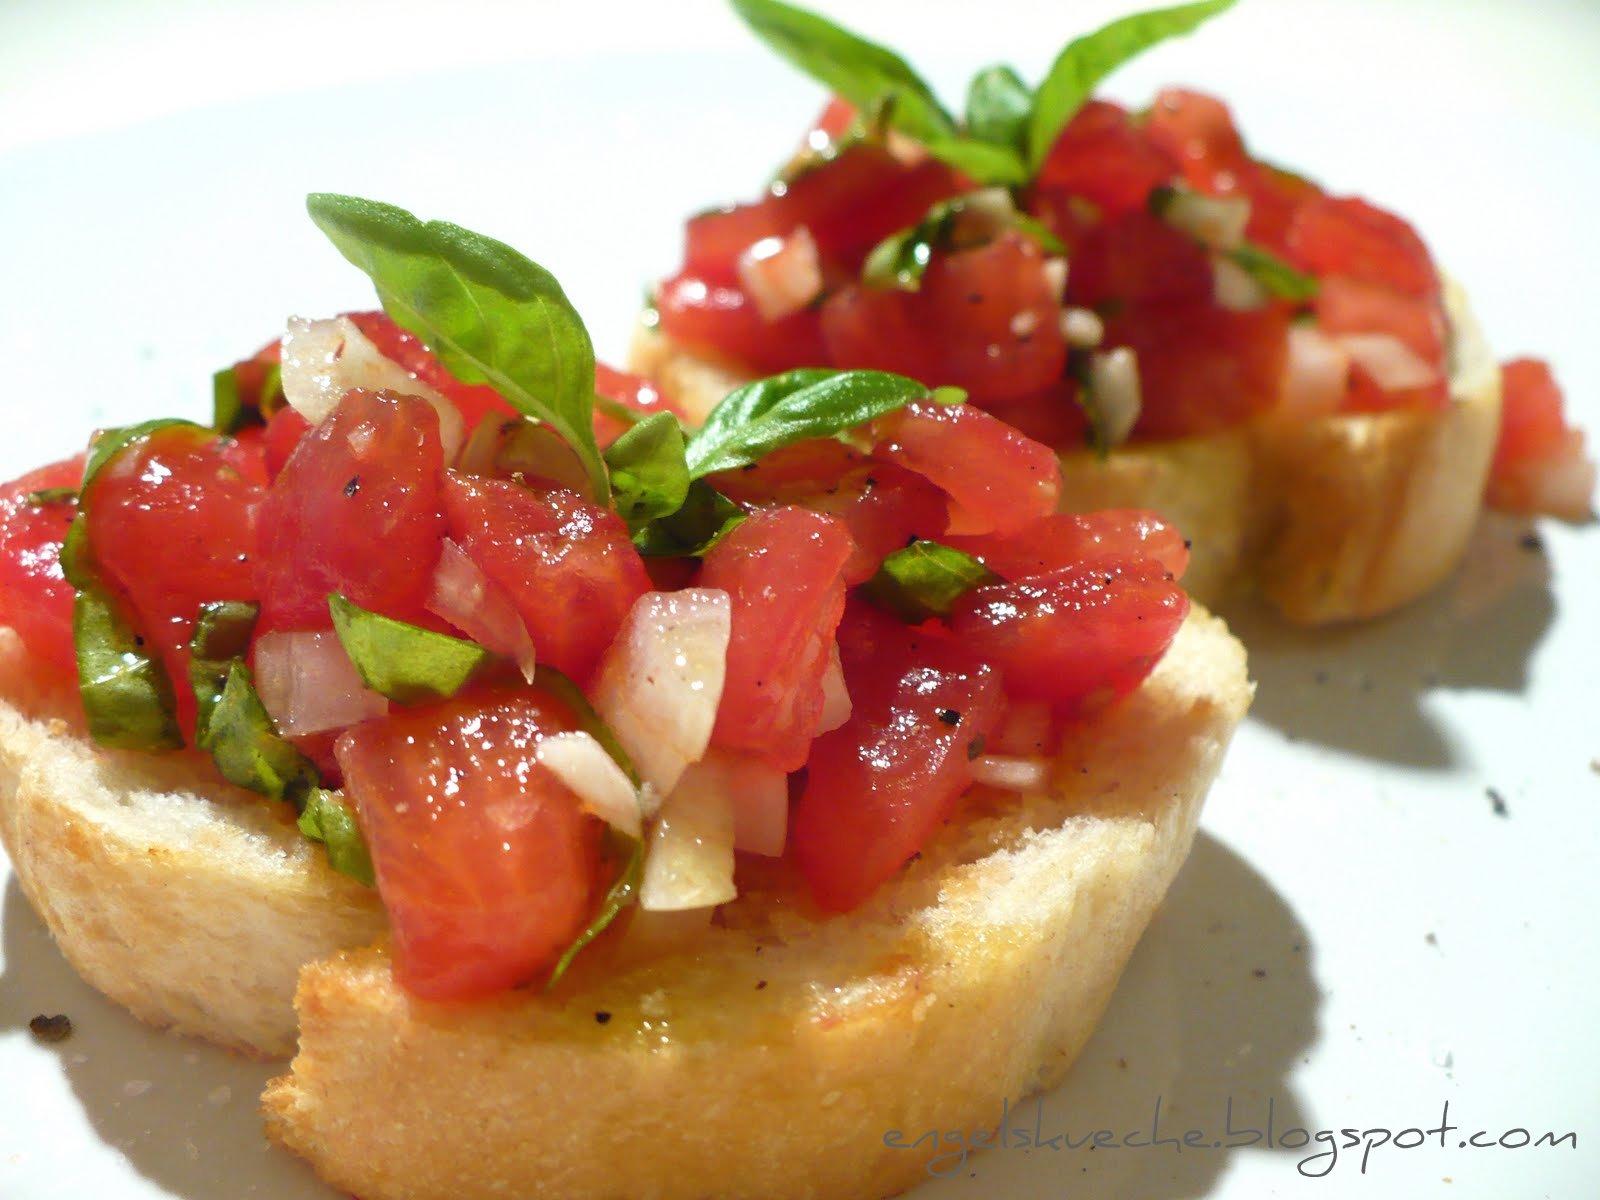 bruschetta tomato bruschetta caprese bruschetta mushroom bruschetta ...